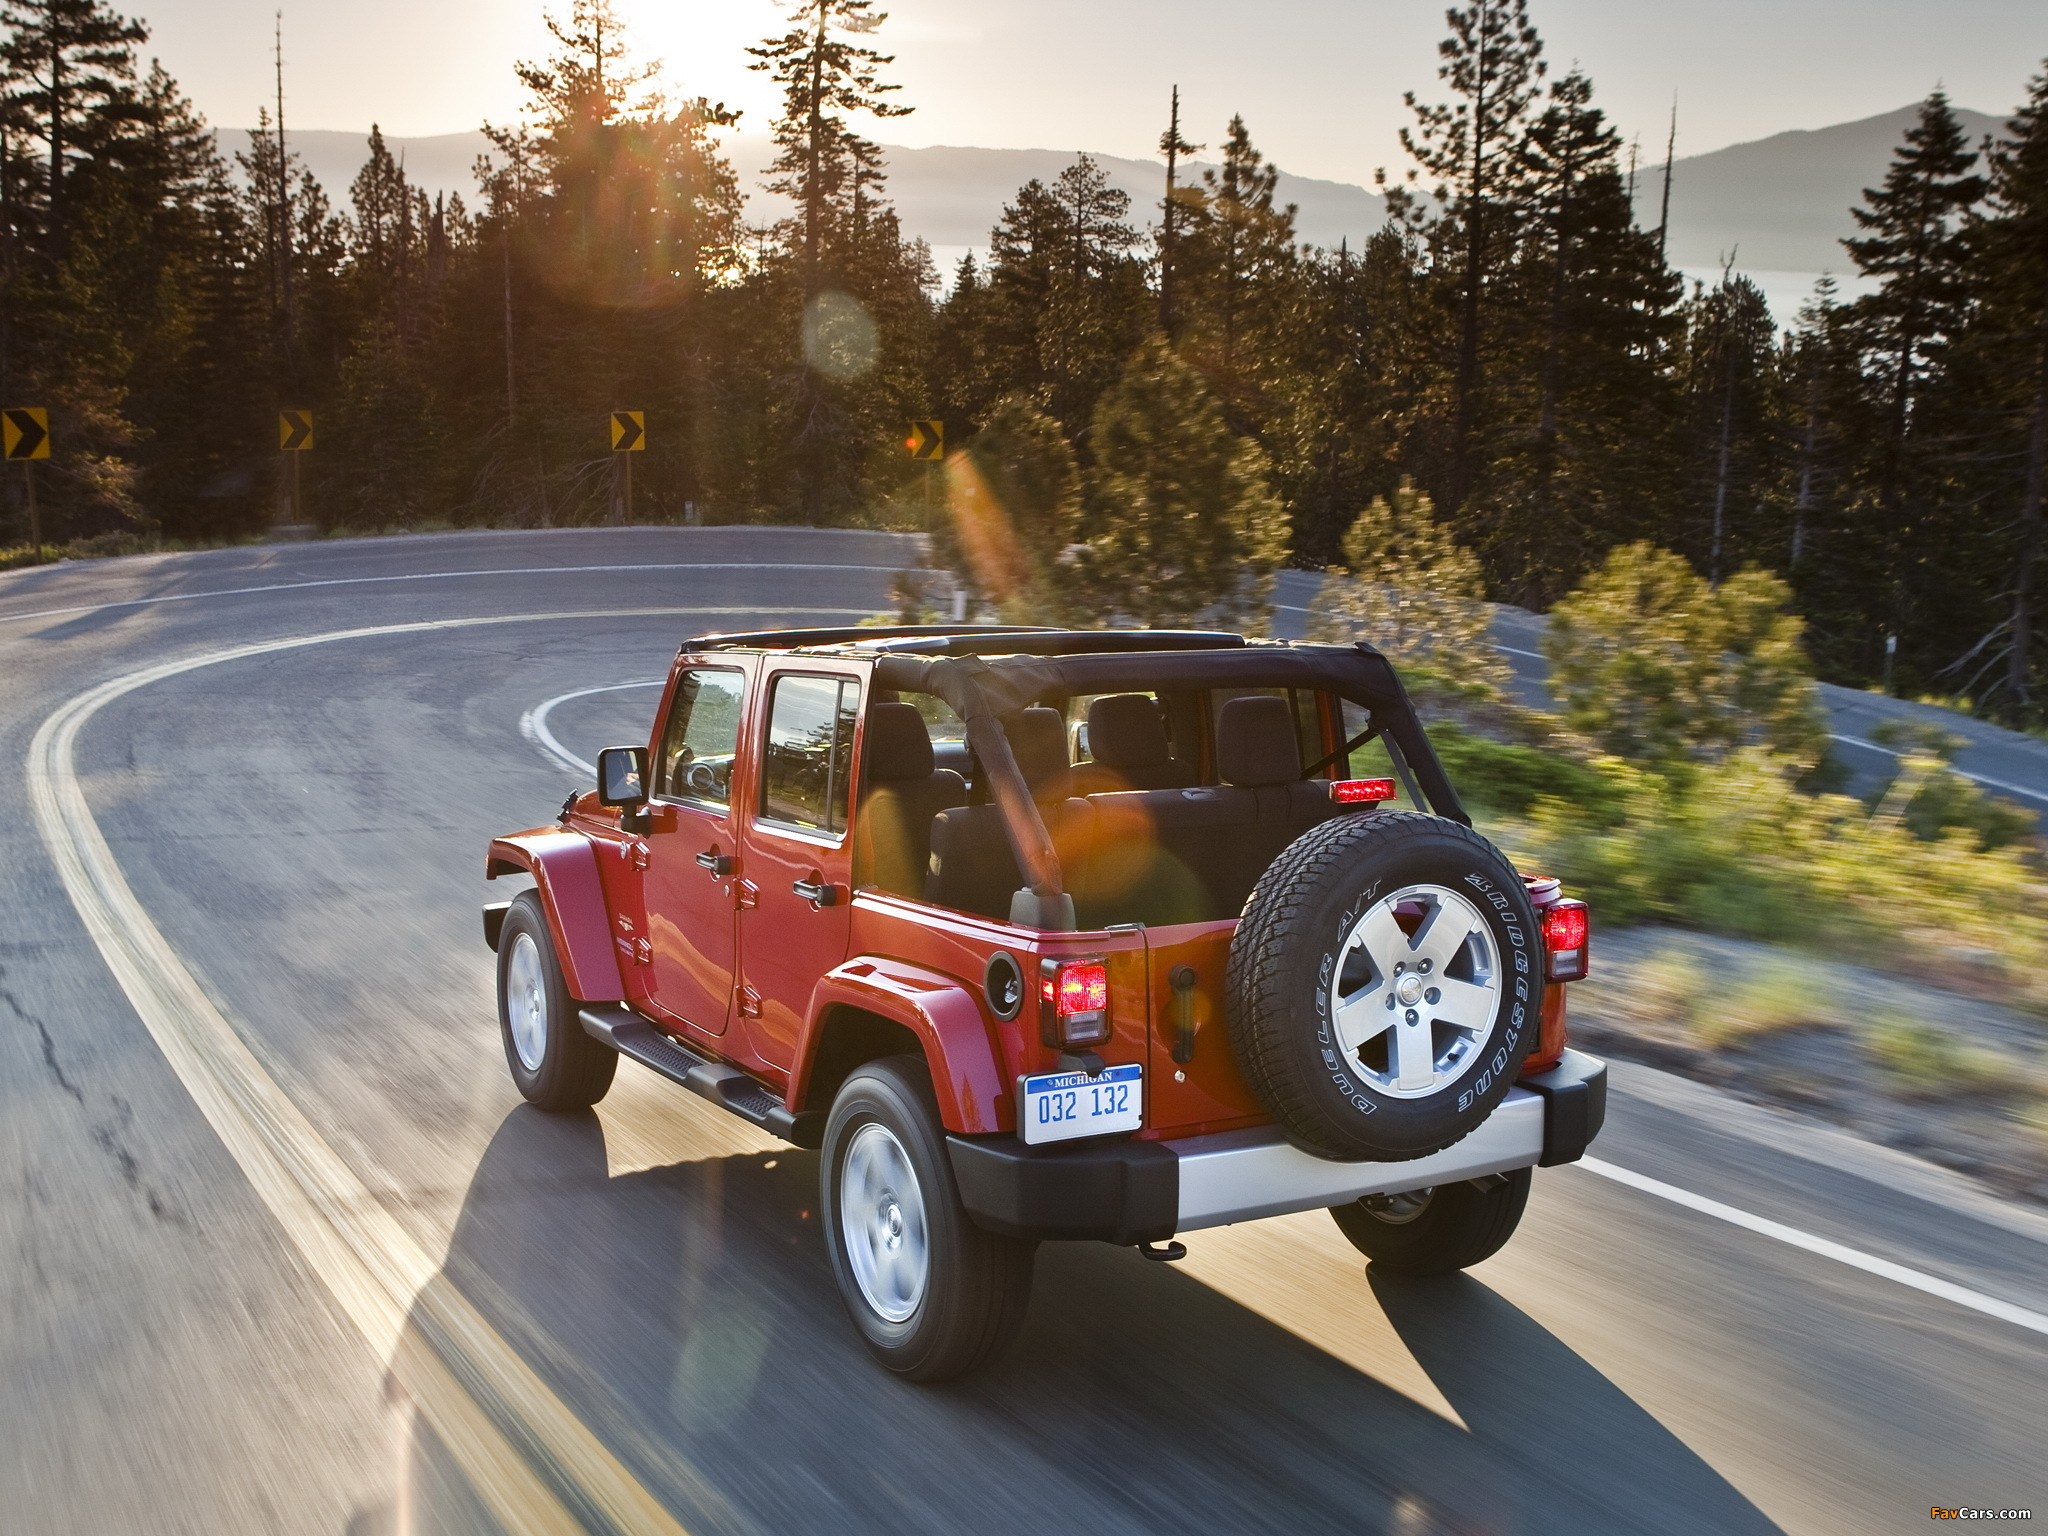 Jeep Wrangler Unlimited Sahara (JK) 2010 wallpapers (2048 x 1536)